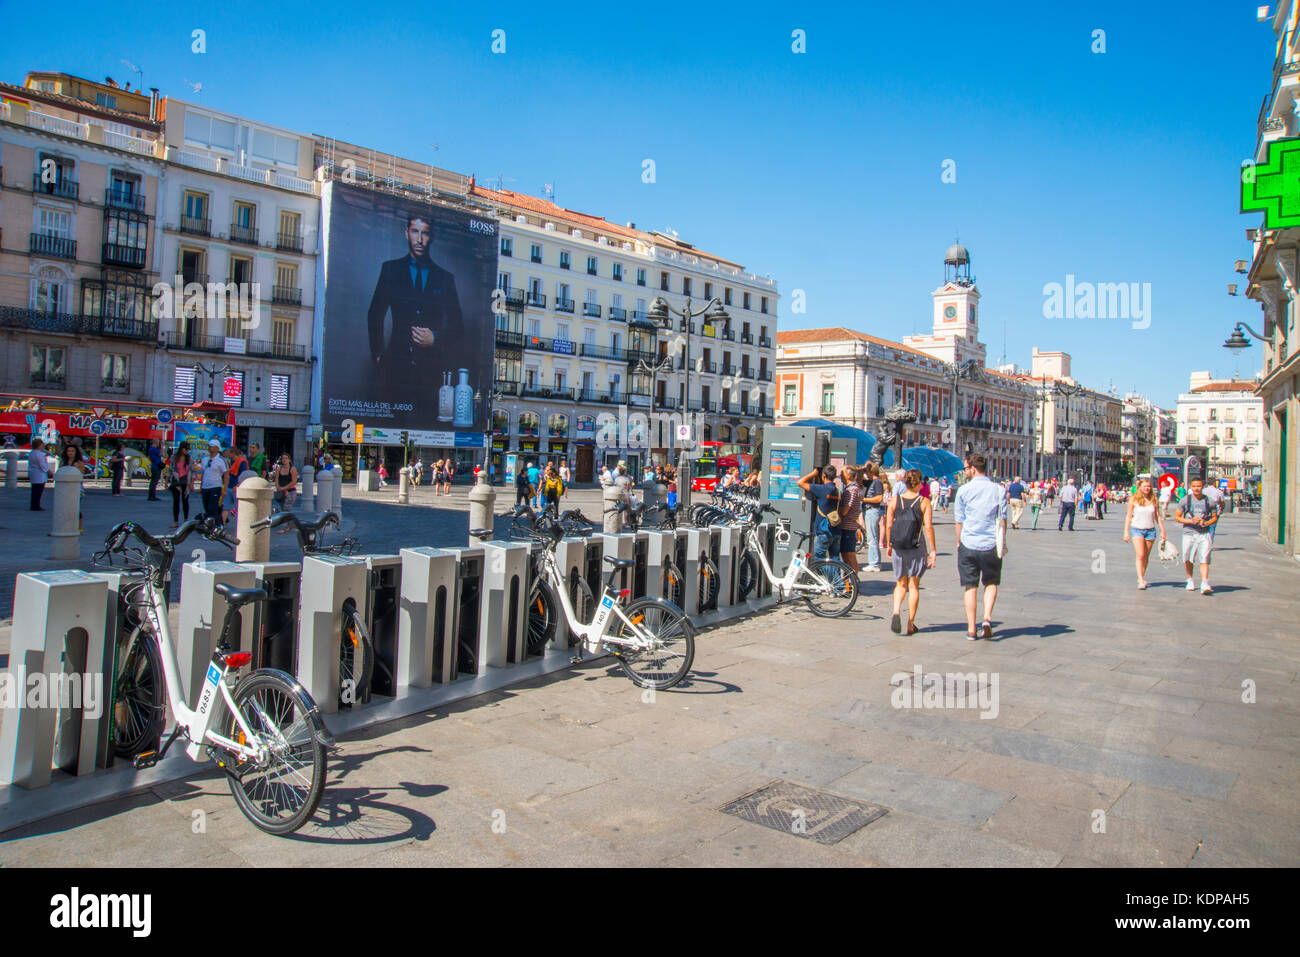 Bike parking. Puerta del Sol, Madrid, Spain. - Stock Image